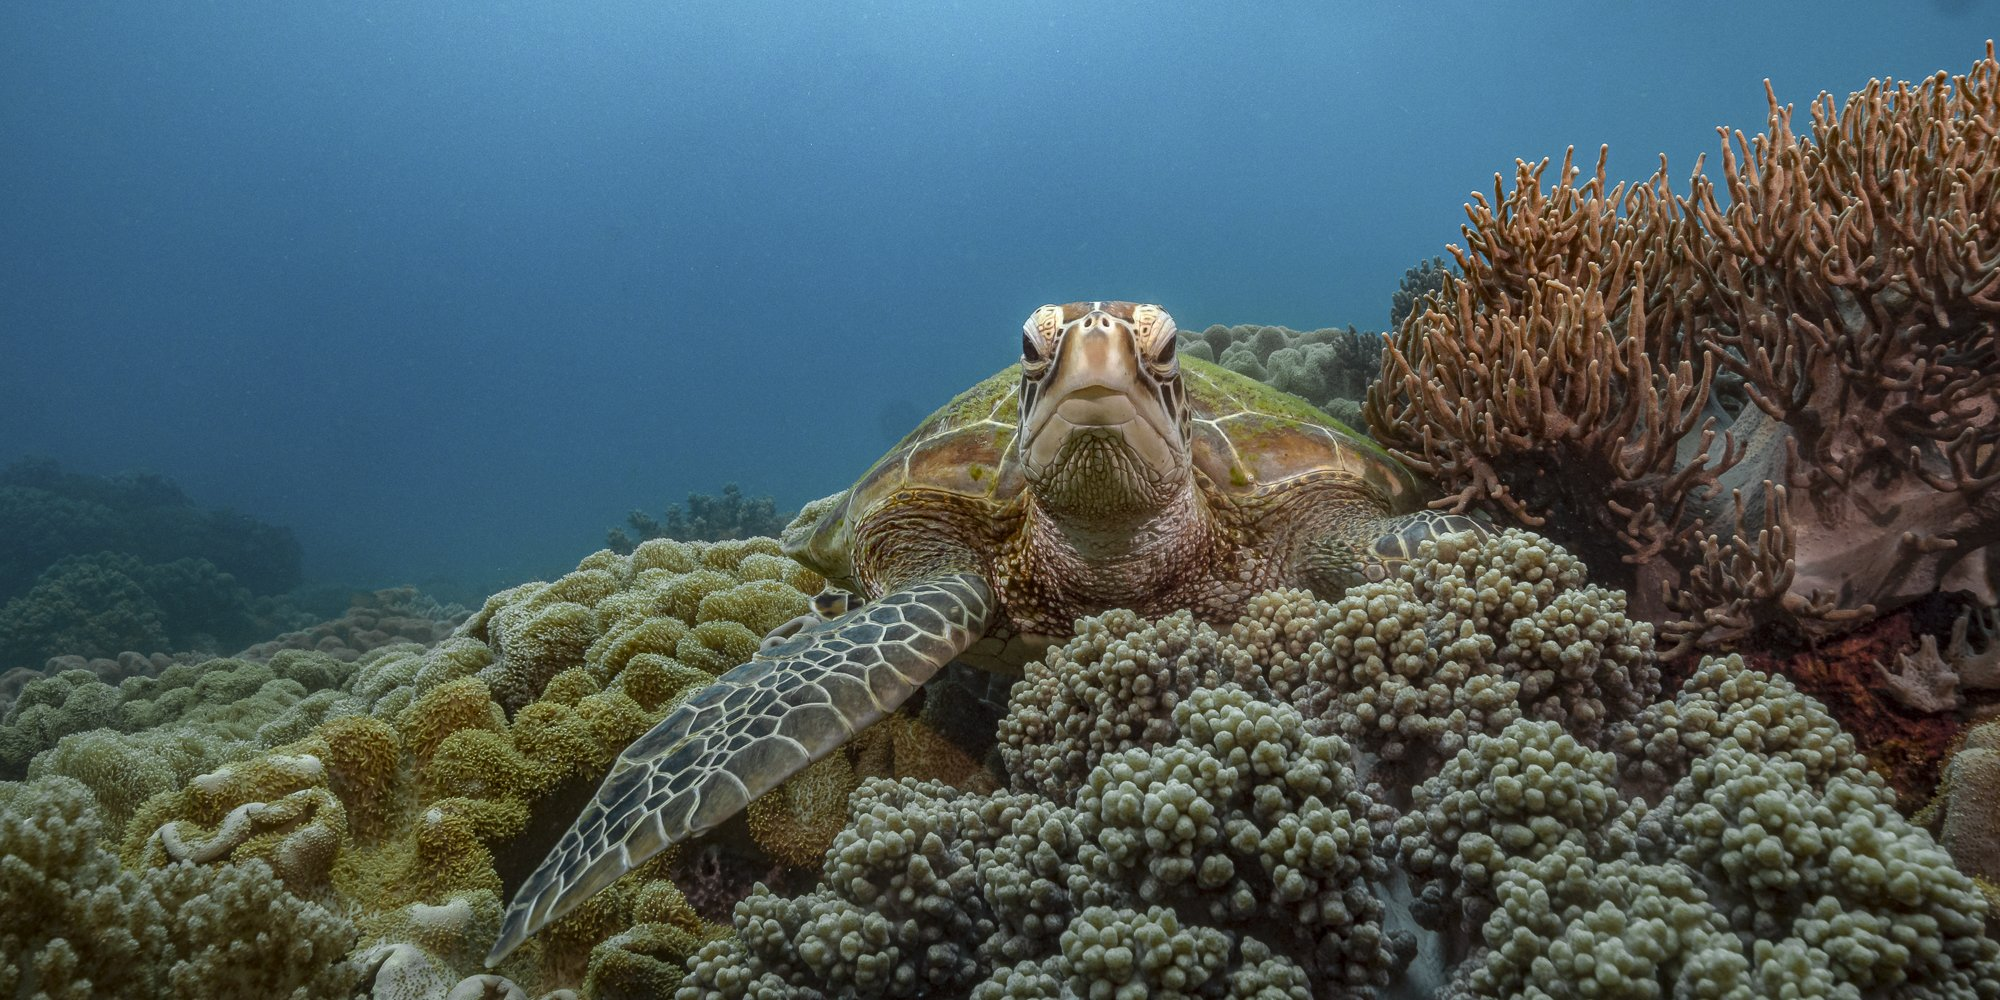 turtle, apo, underwater, diving, philippines, Савин Андрей